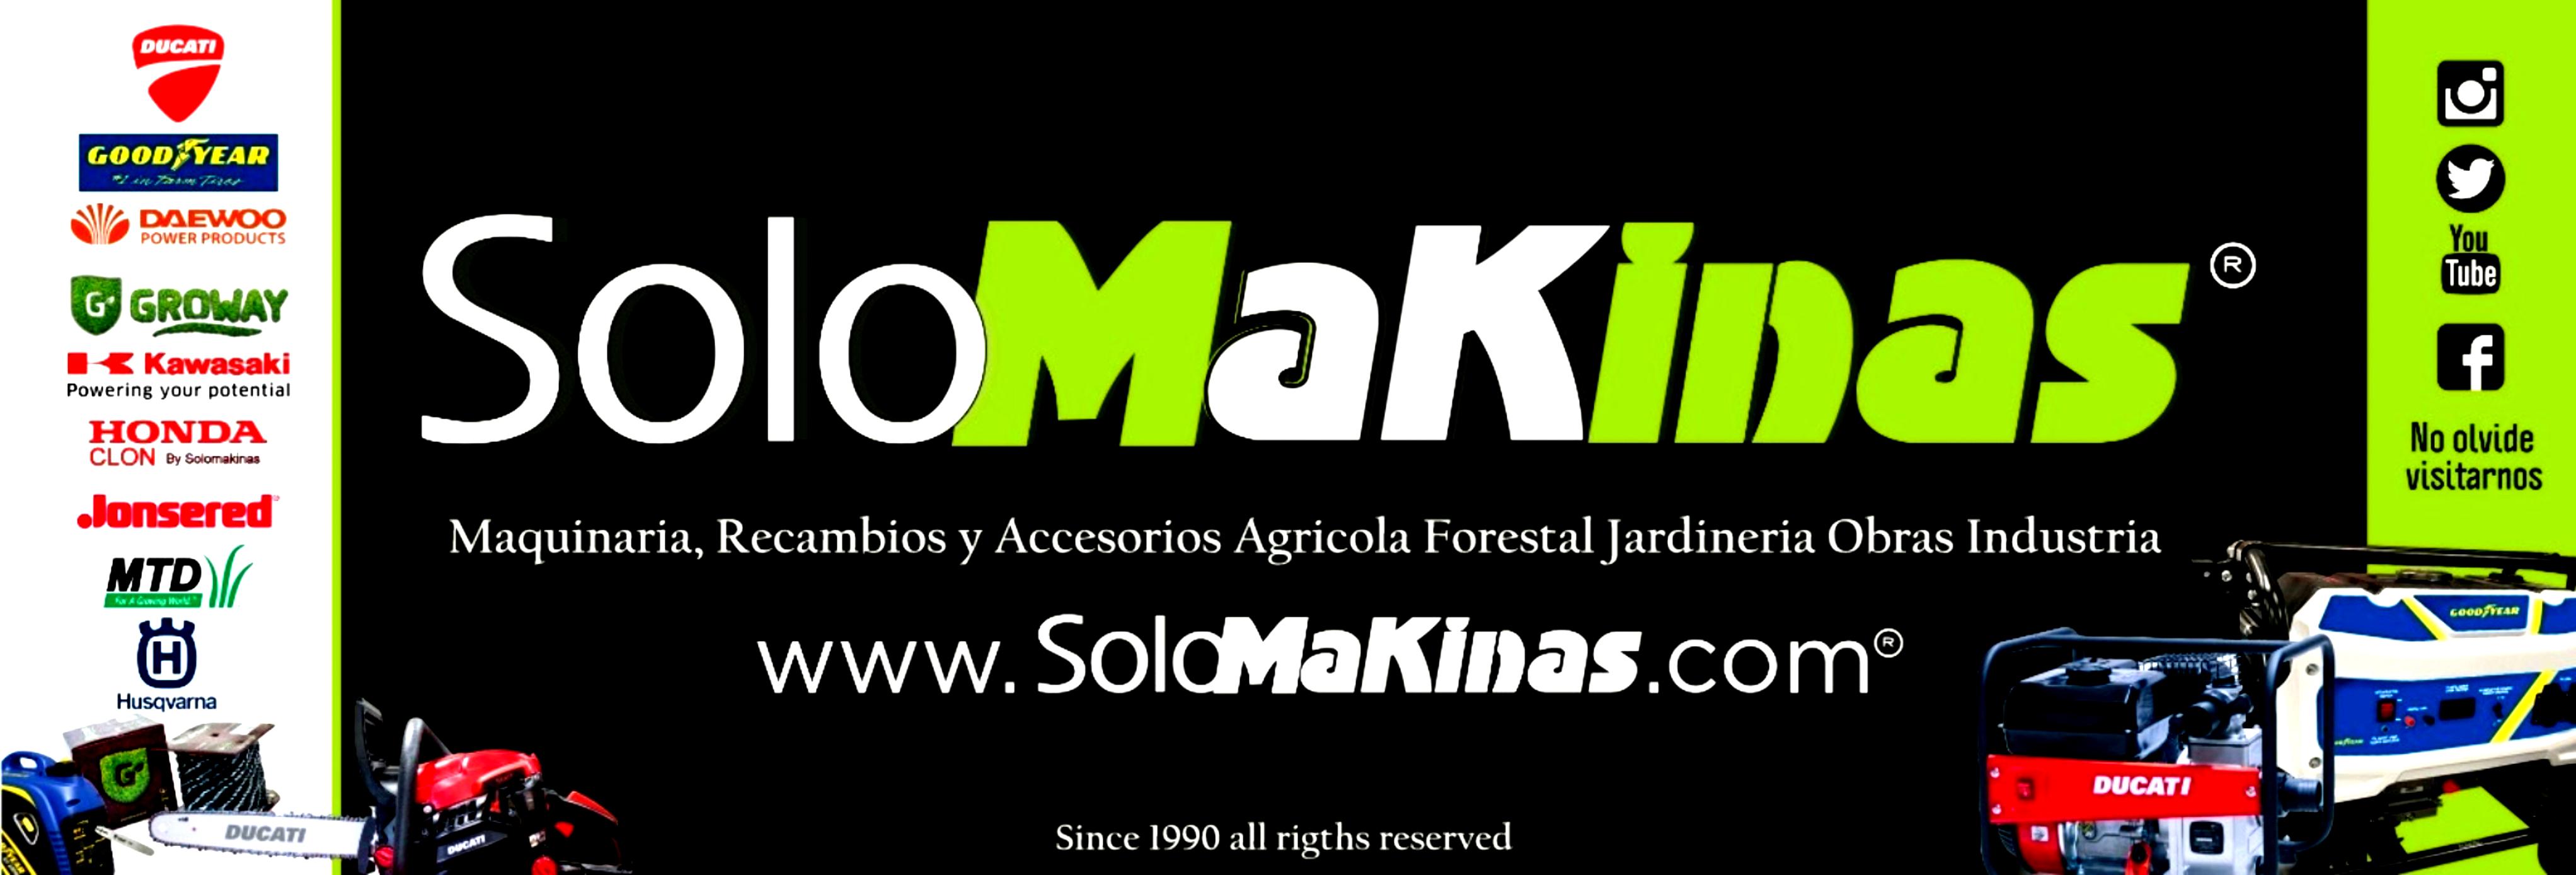 www.solomakinas.com